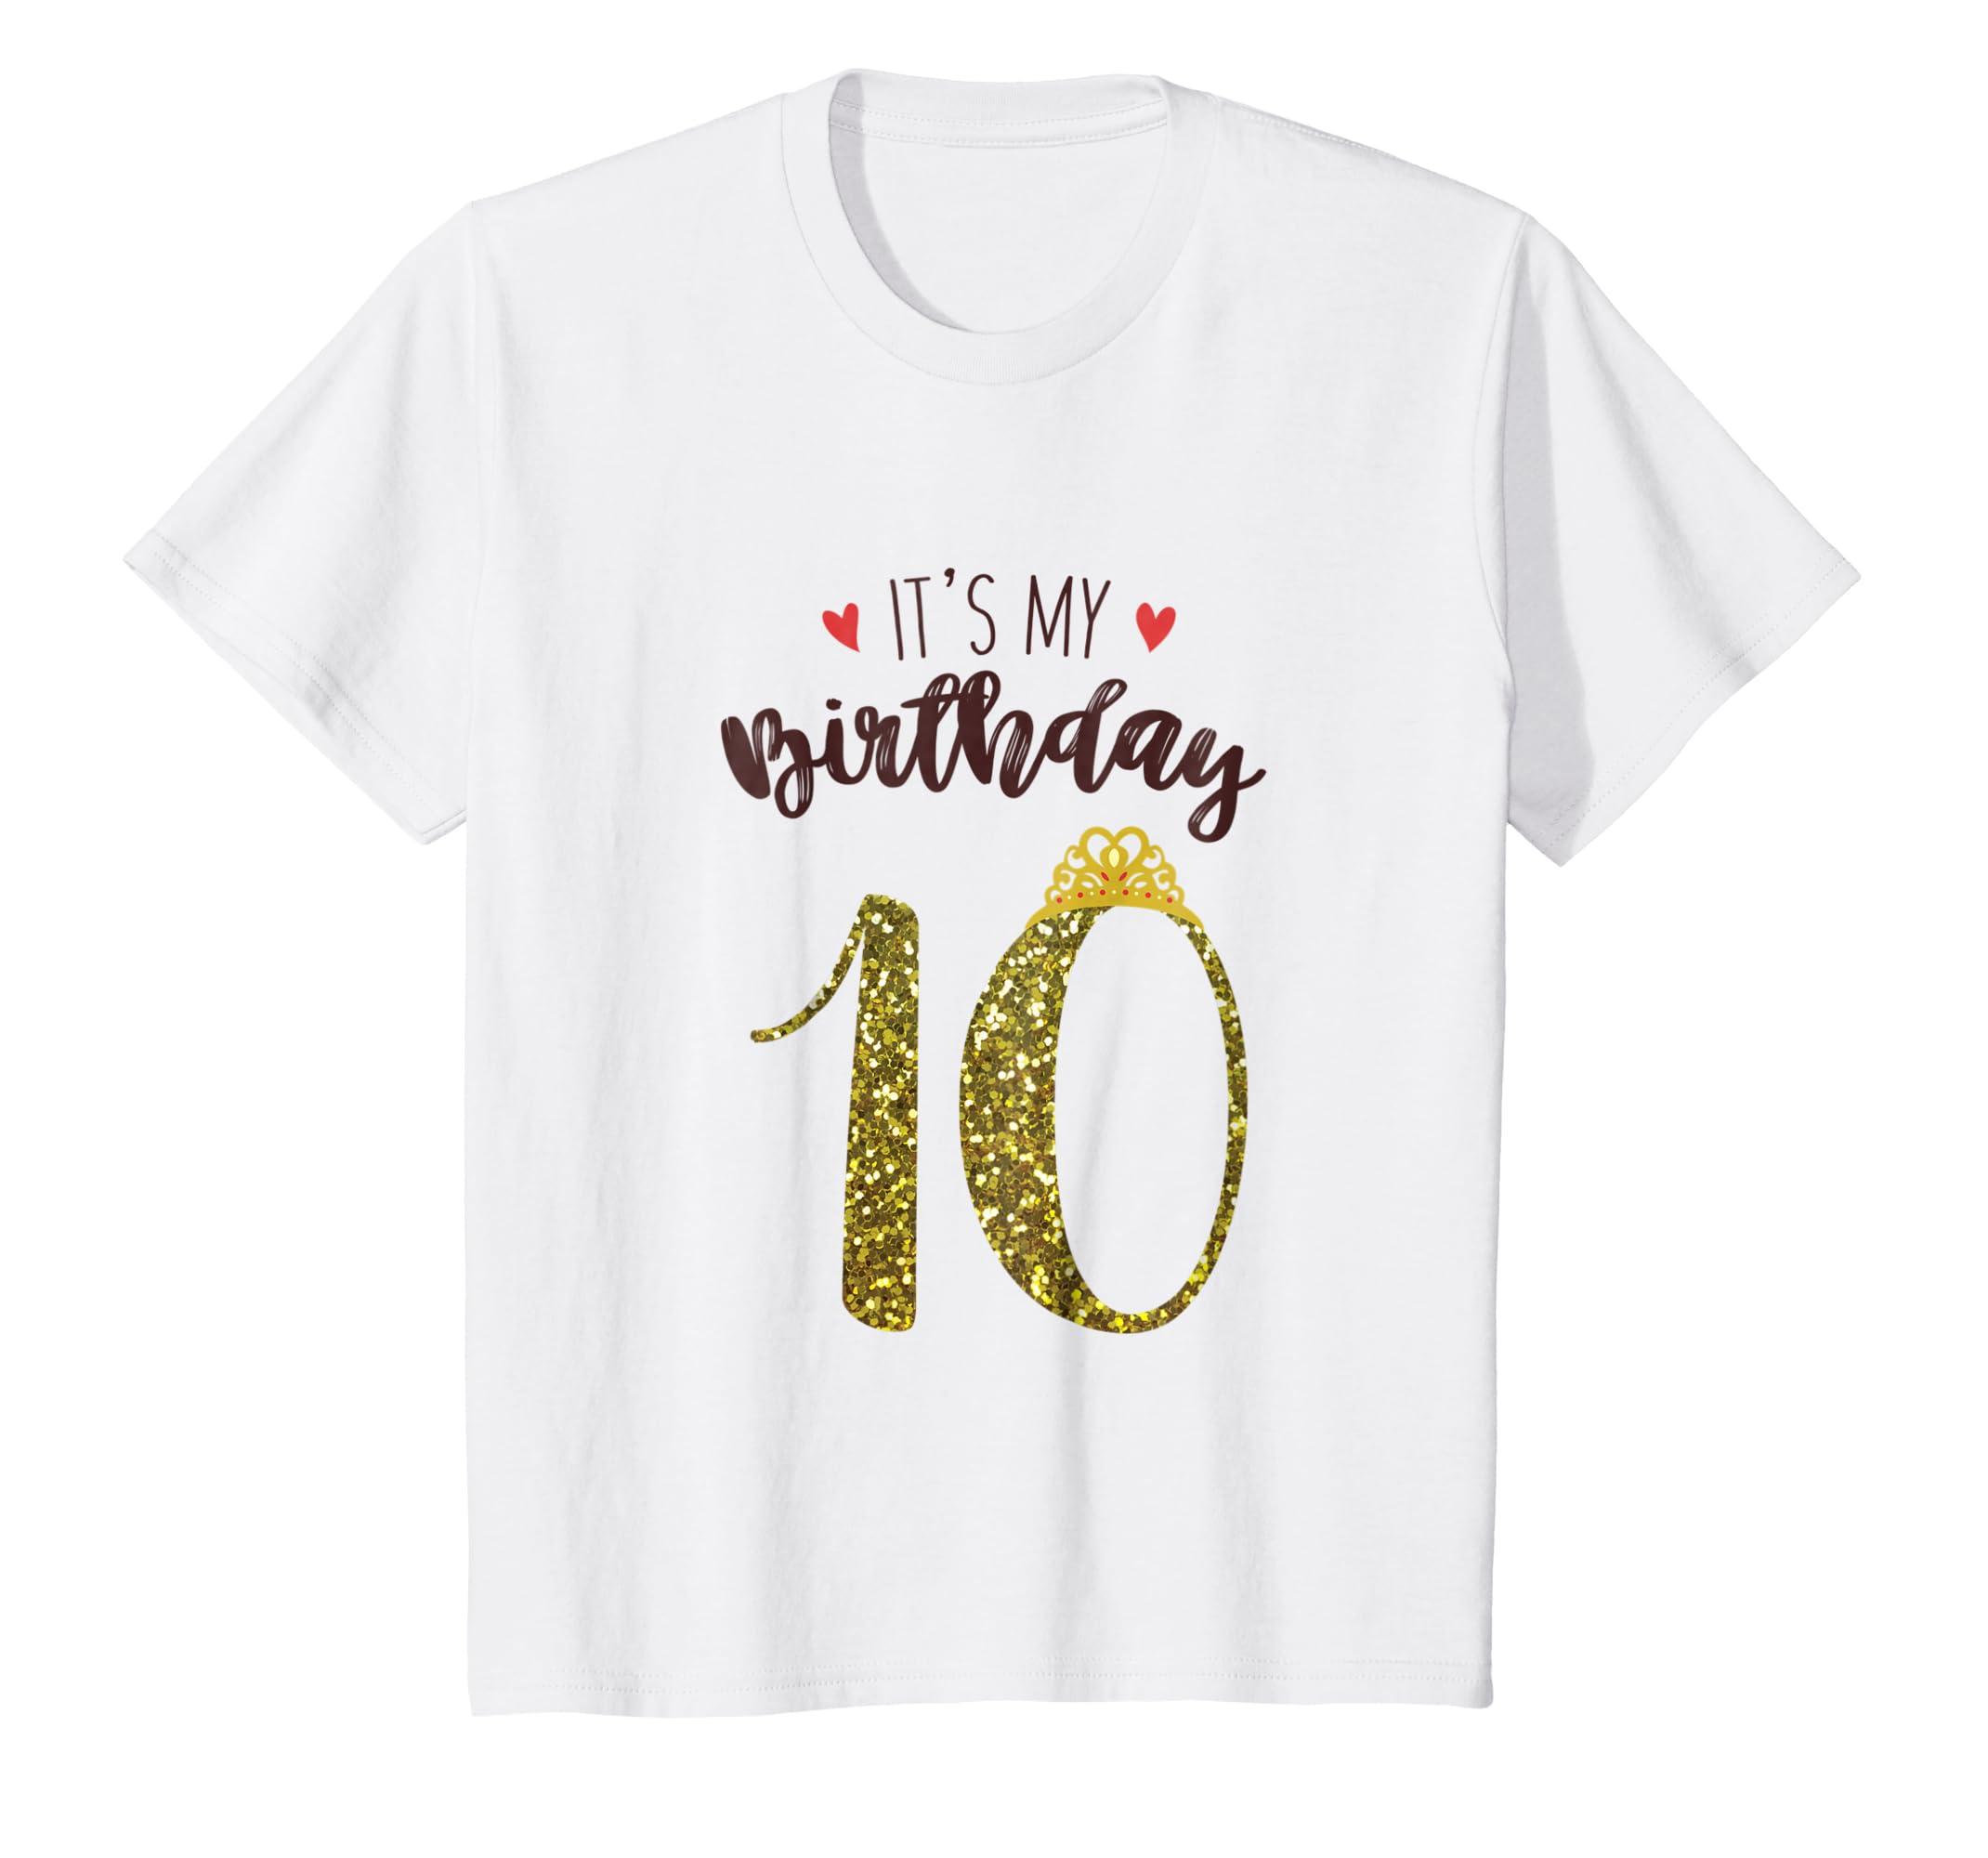 Kids It's My 10th Birthday   Girls Princess Birthday Tiara Shirt-Teechatpro